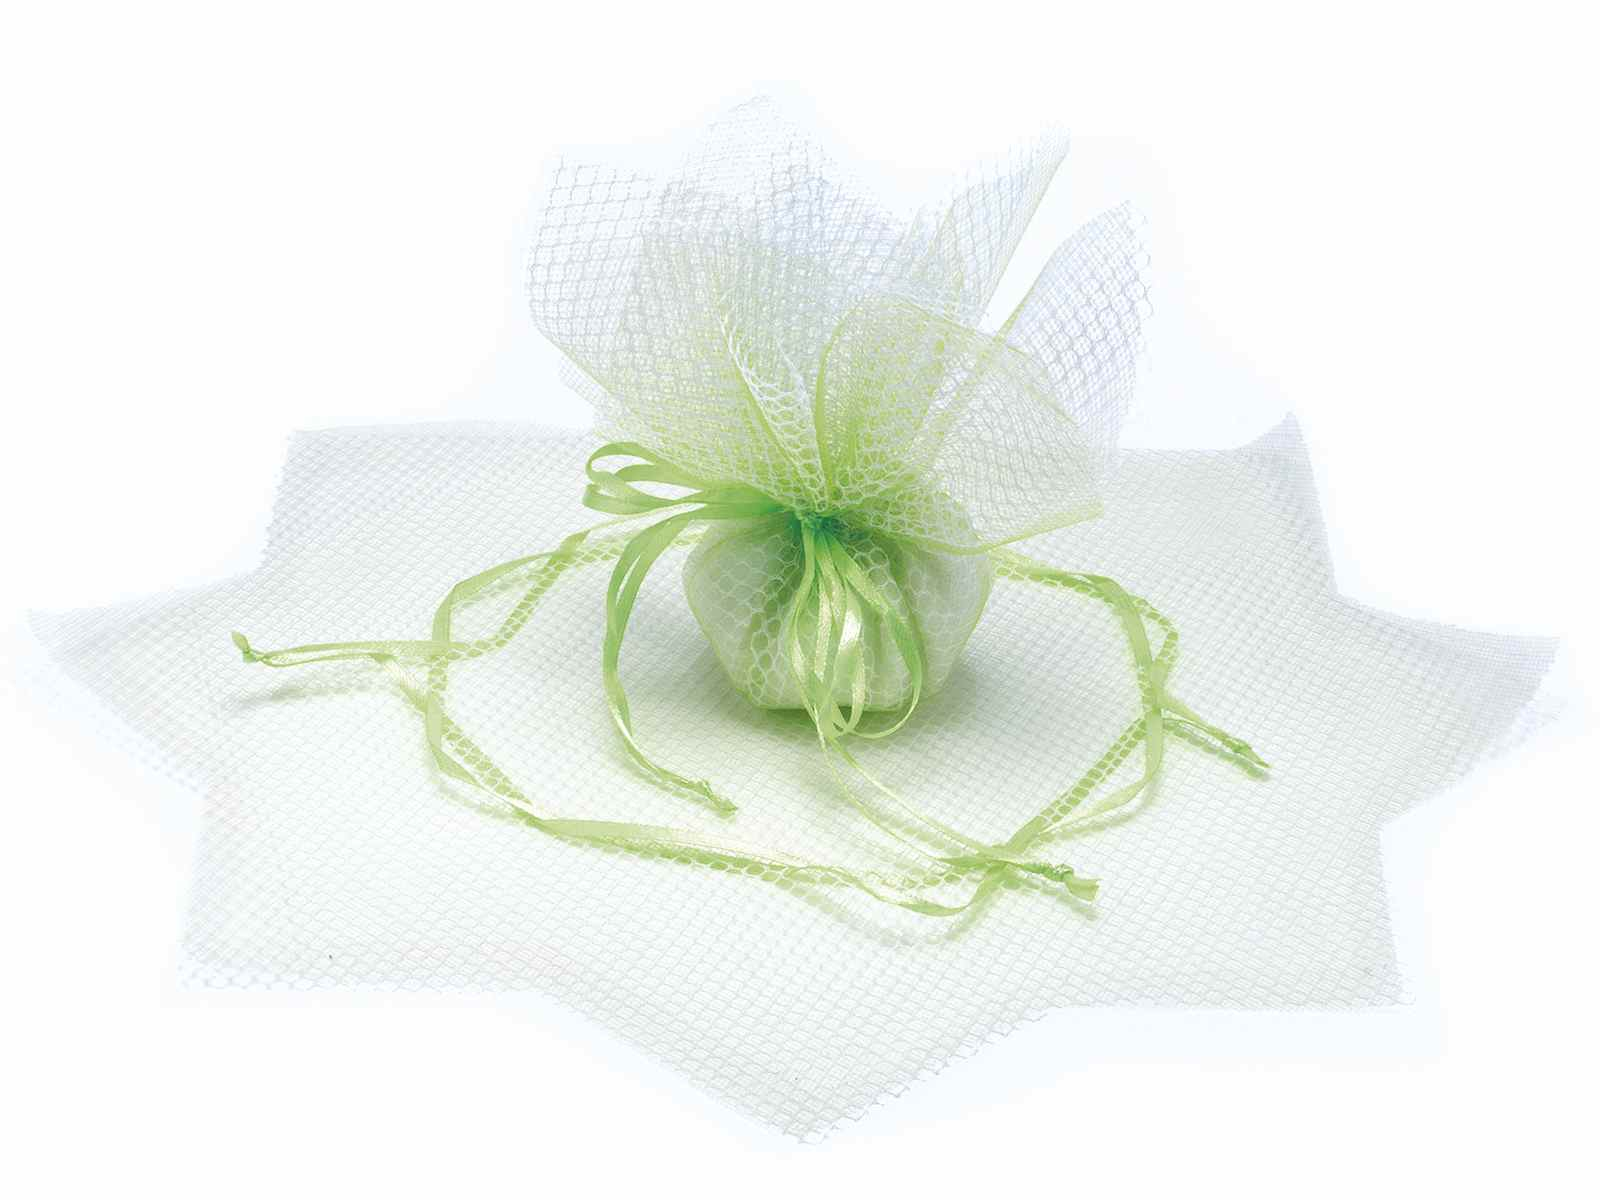 Tulle a sacchetto a rete verde mela con tirante base a stella e bicolore